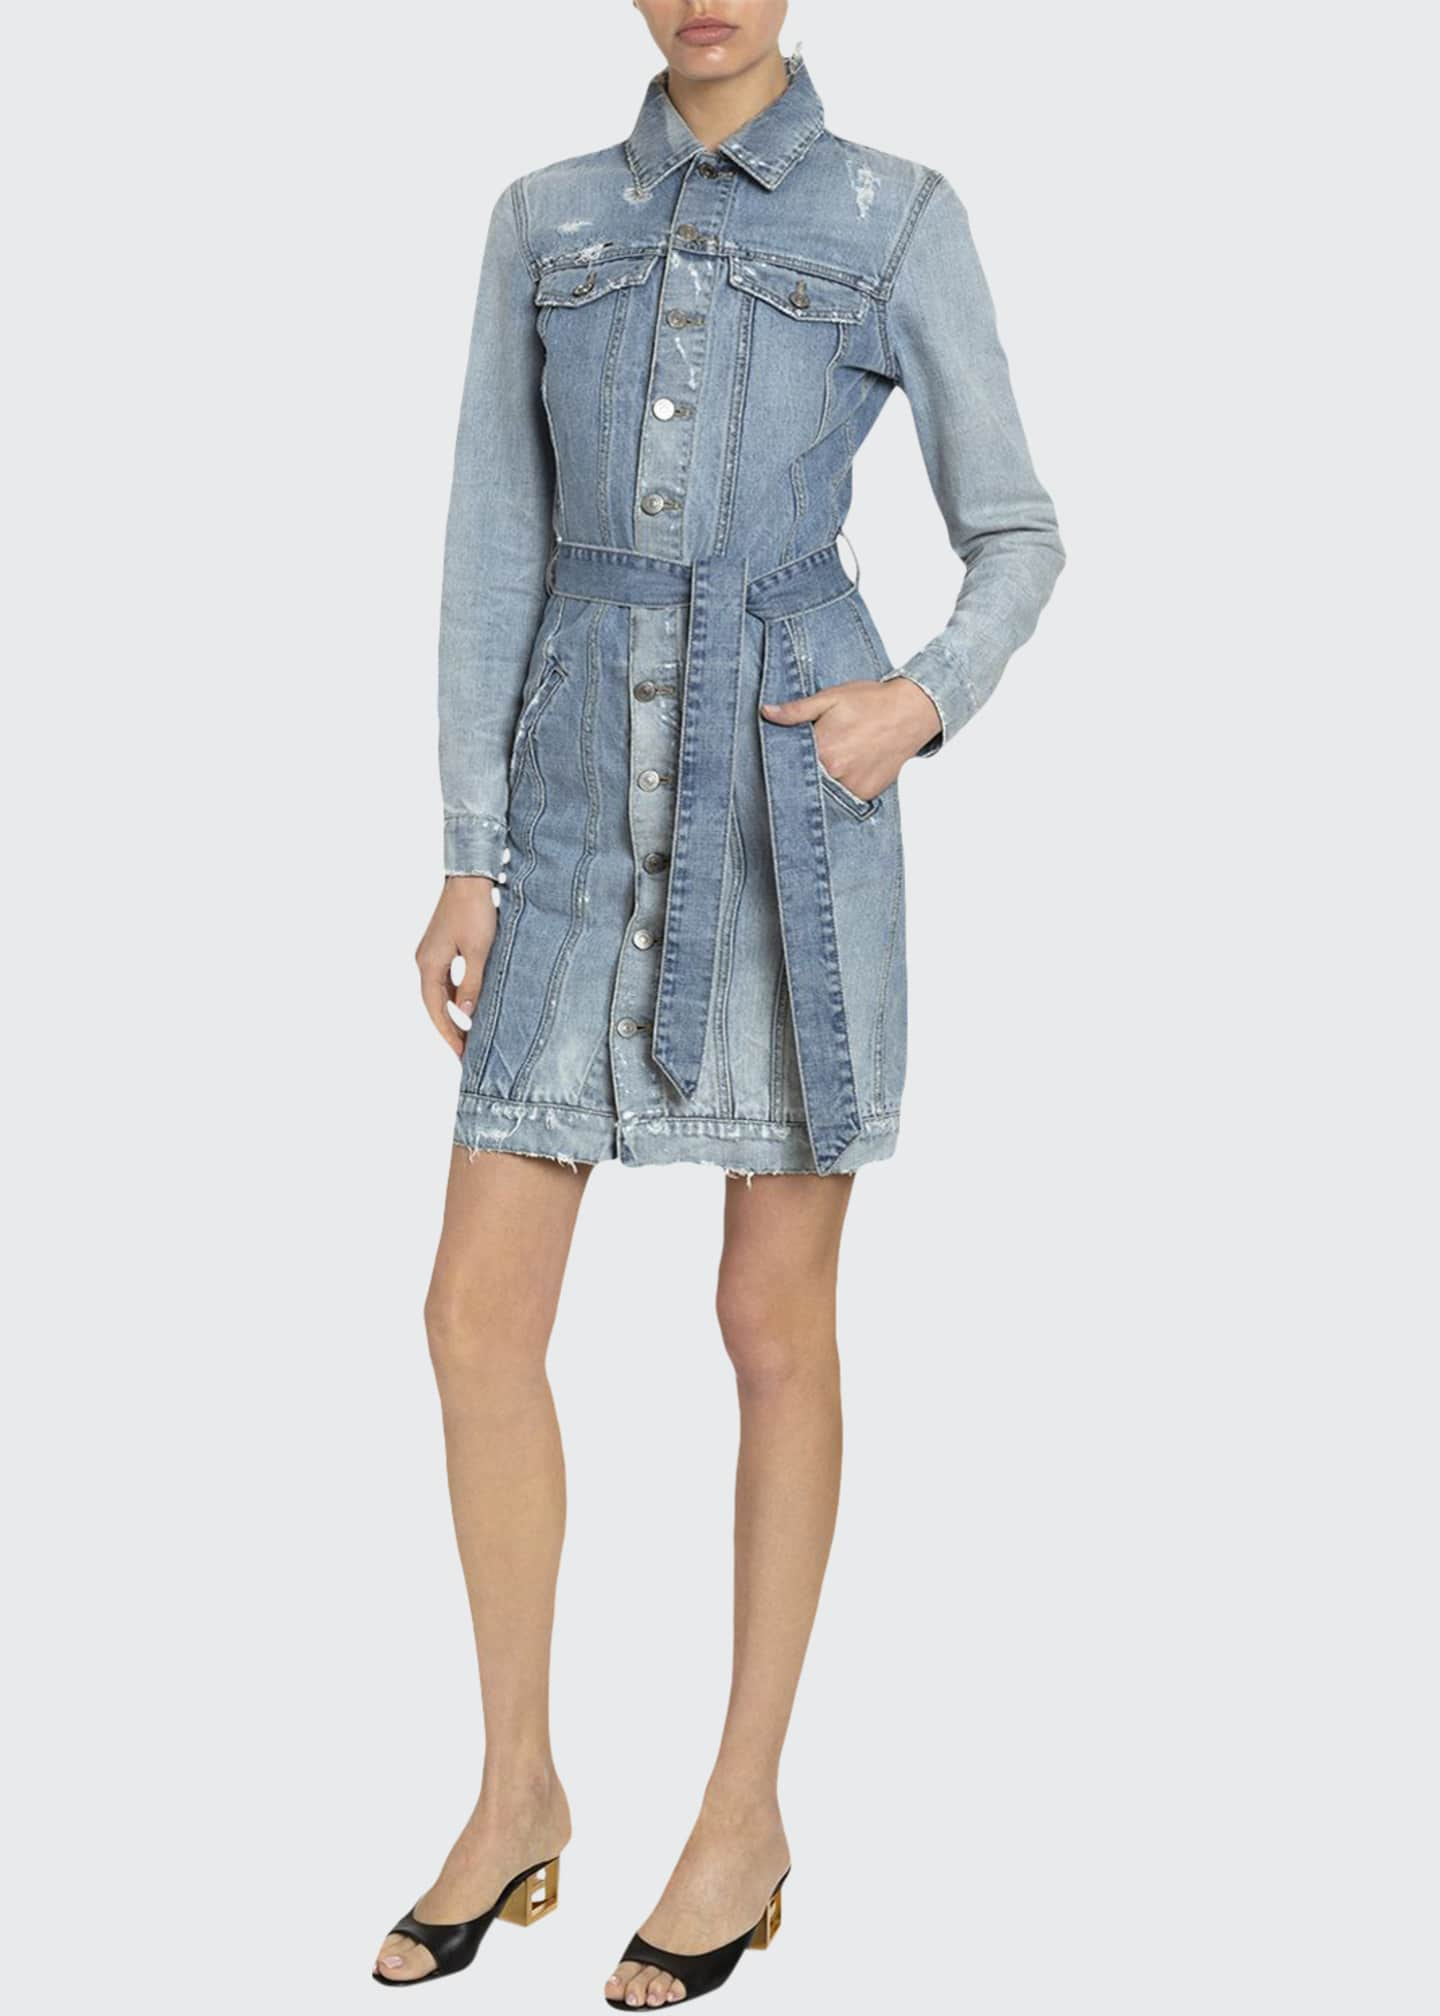 Givenchy Washed Denim Belted Shirtdress